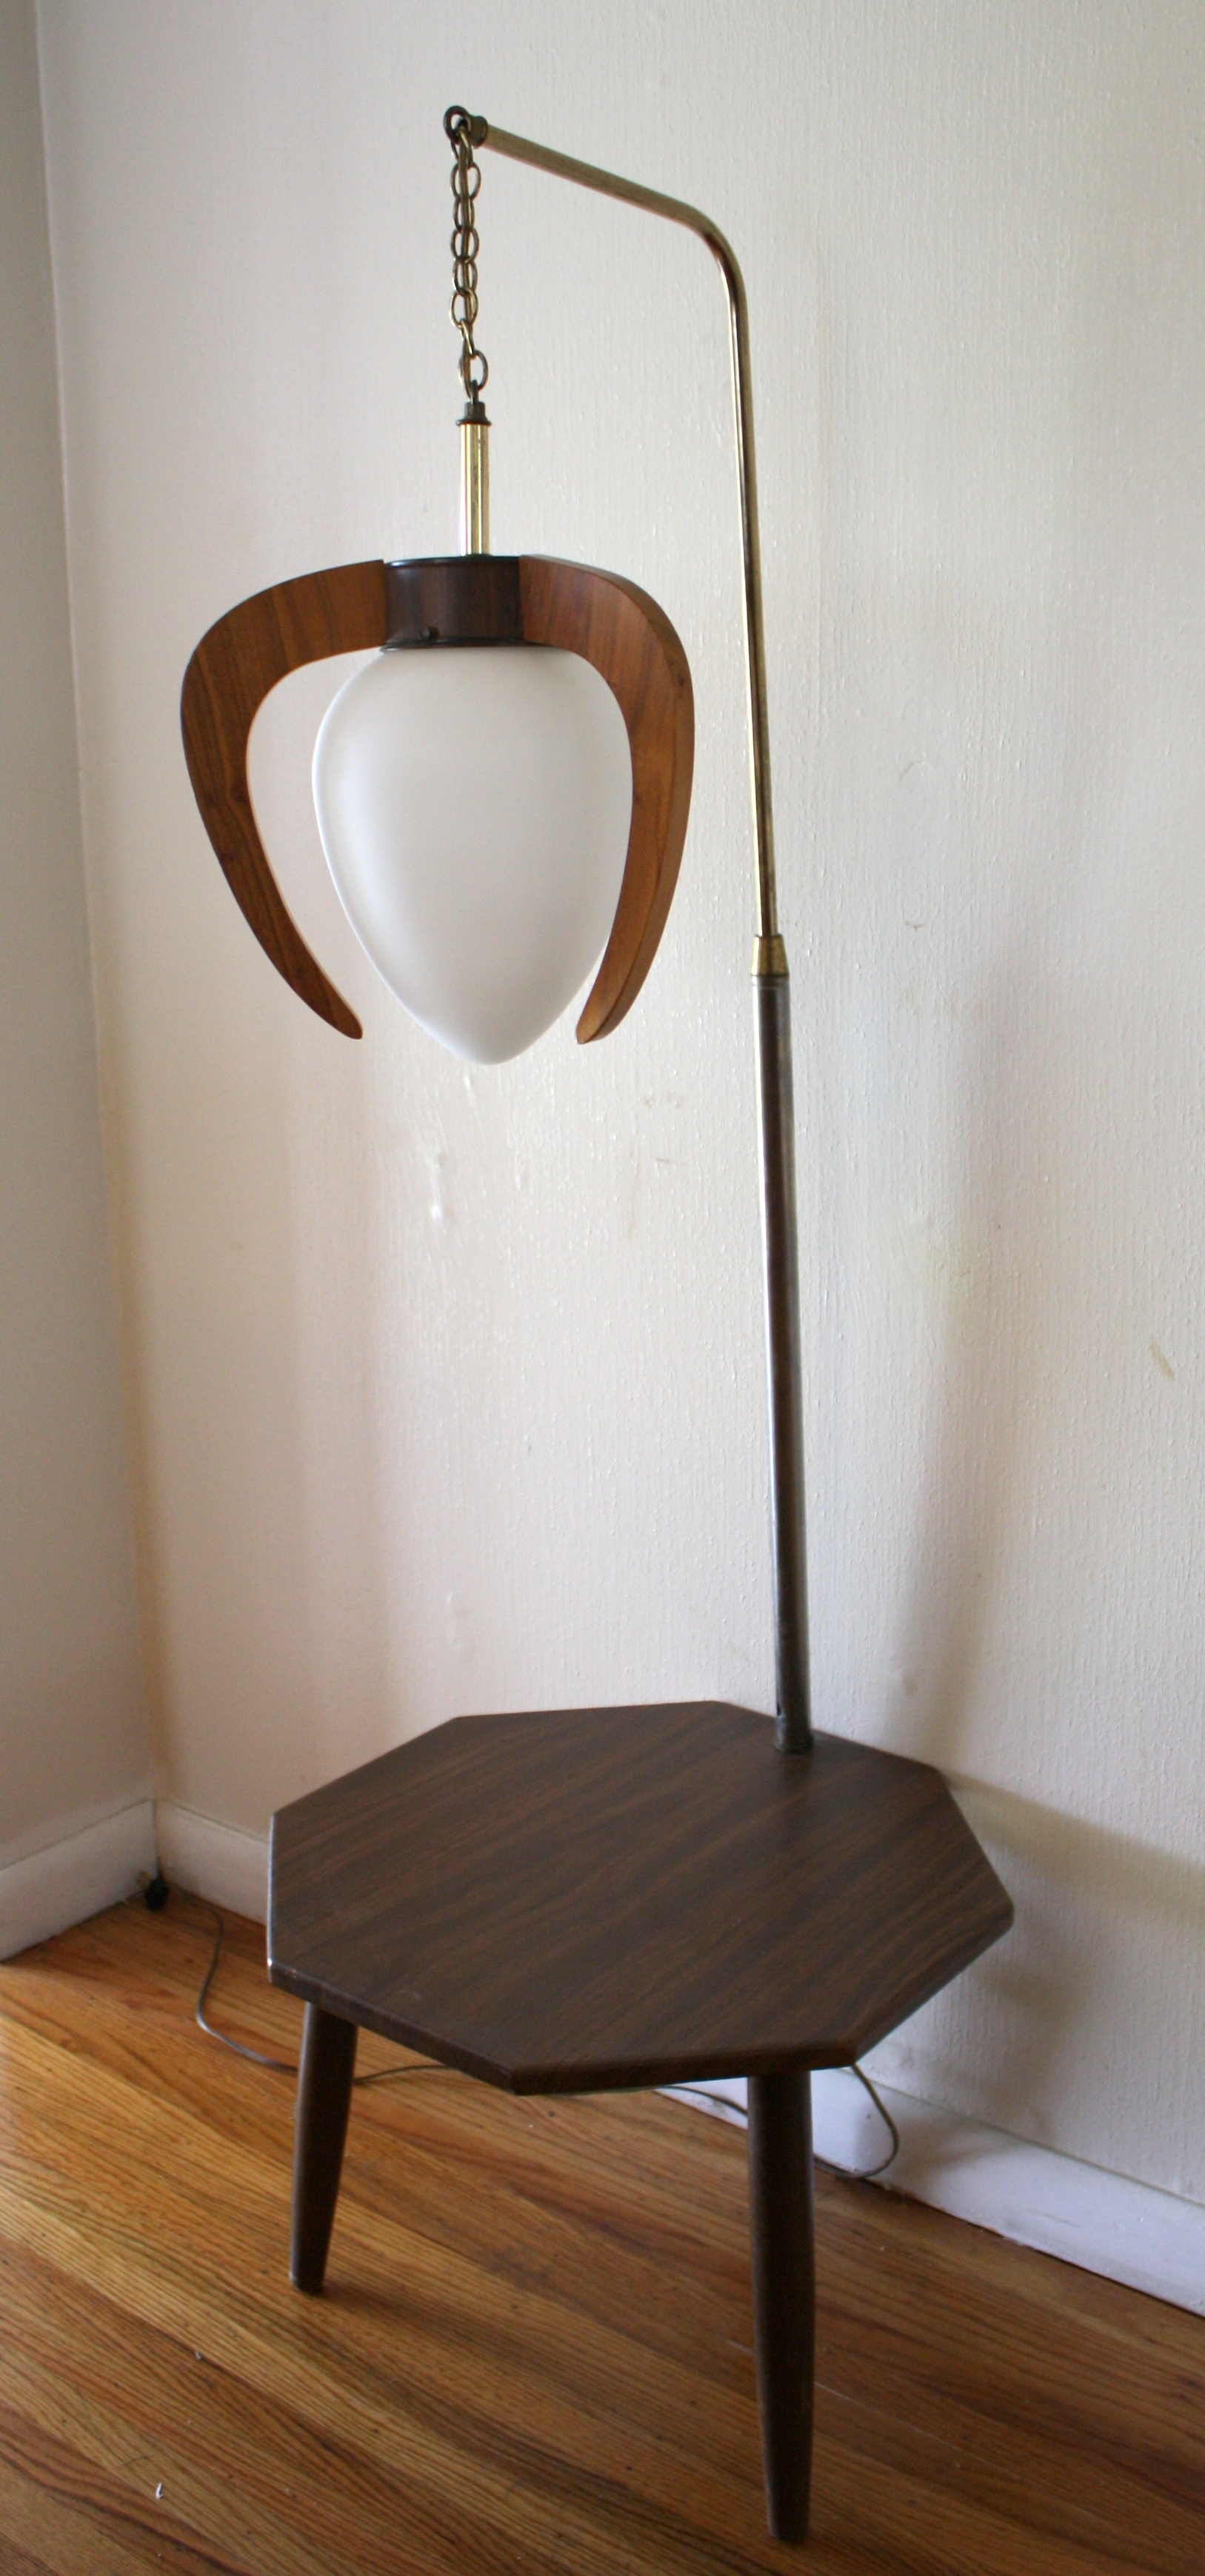 mid century modern pendant lamp table combination picked vintage. Black Bedroom Furniture Sets. Home Design Ideas